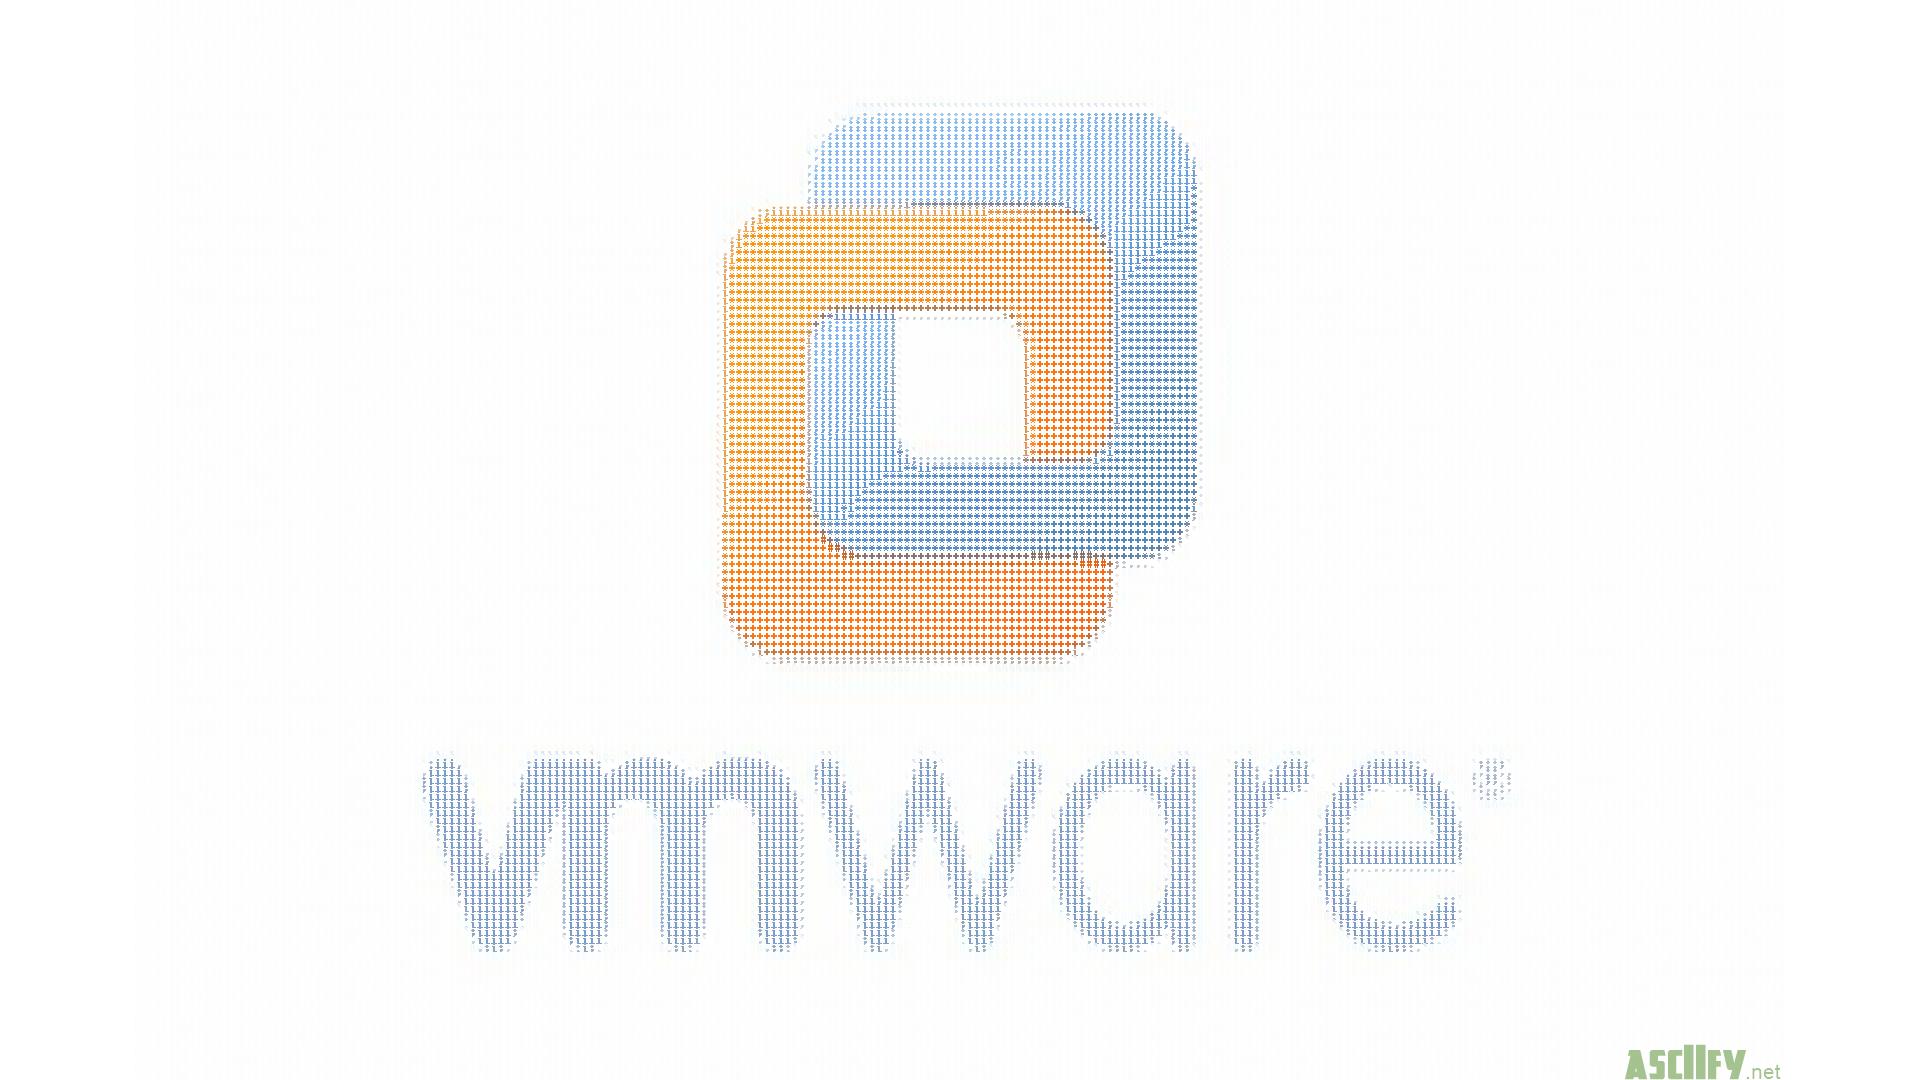 ASCIIfy net - vmware